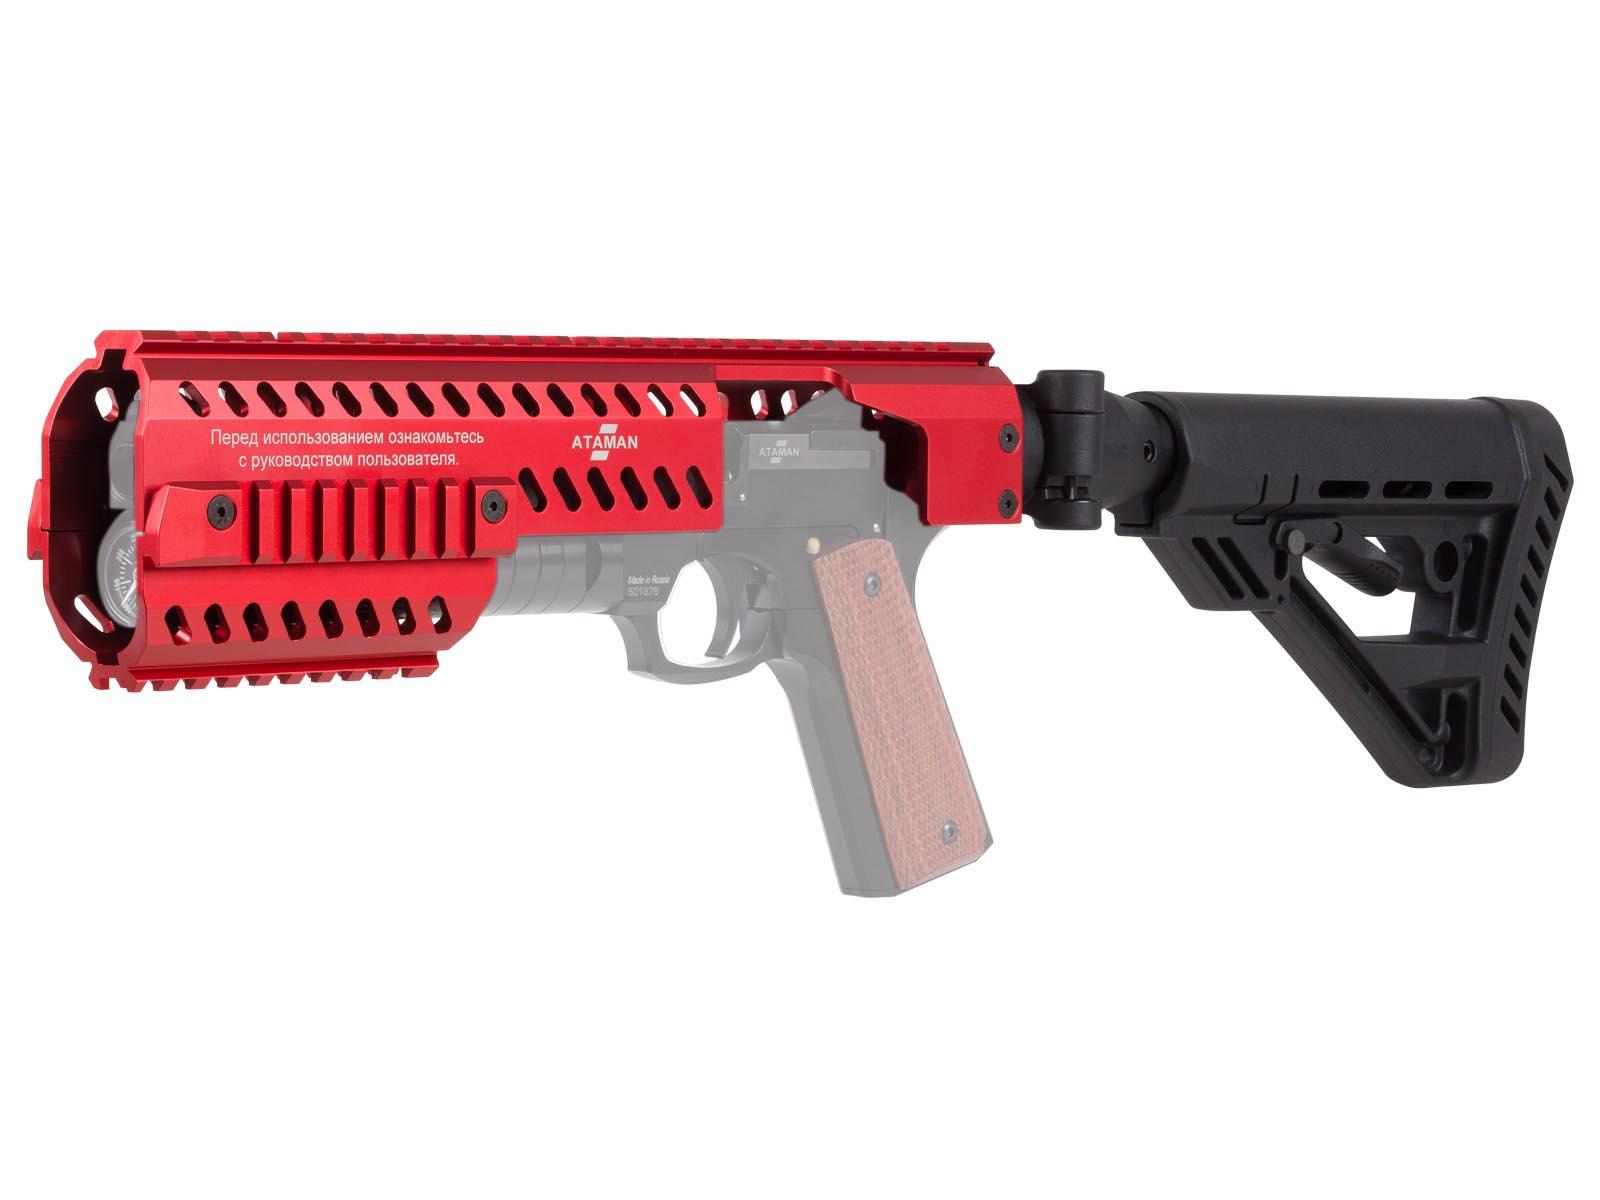 Ataman P2C Conversion Kit, Compact, Red